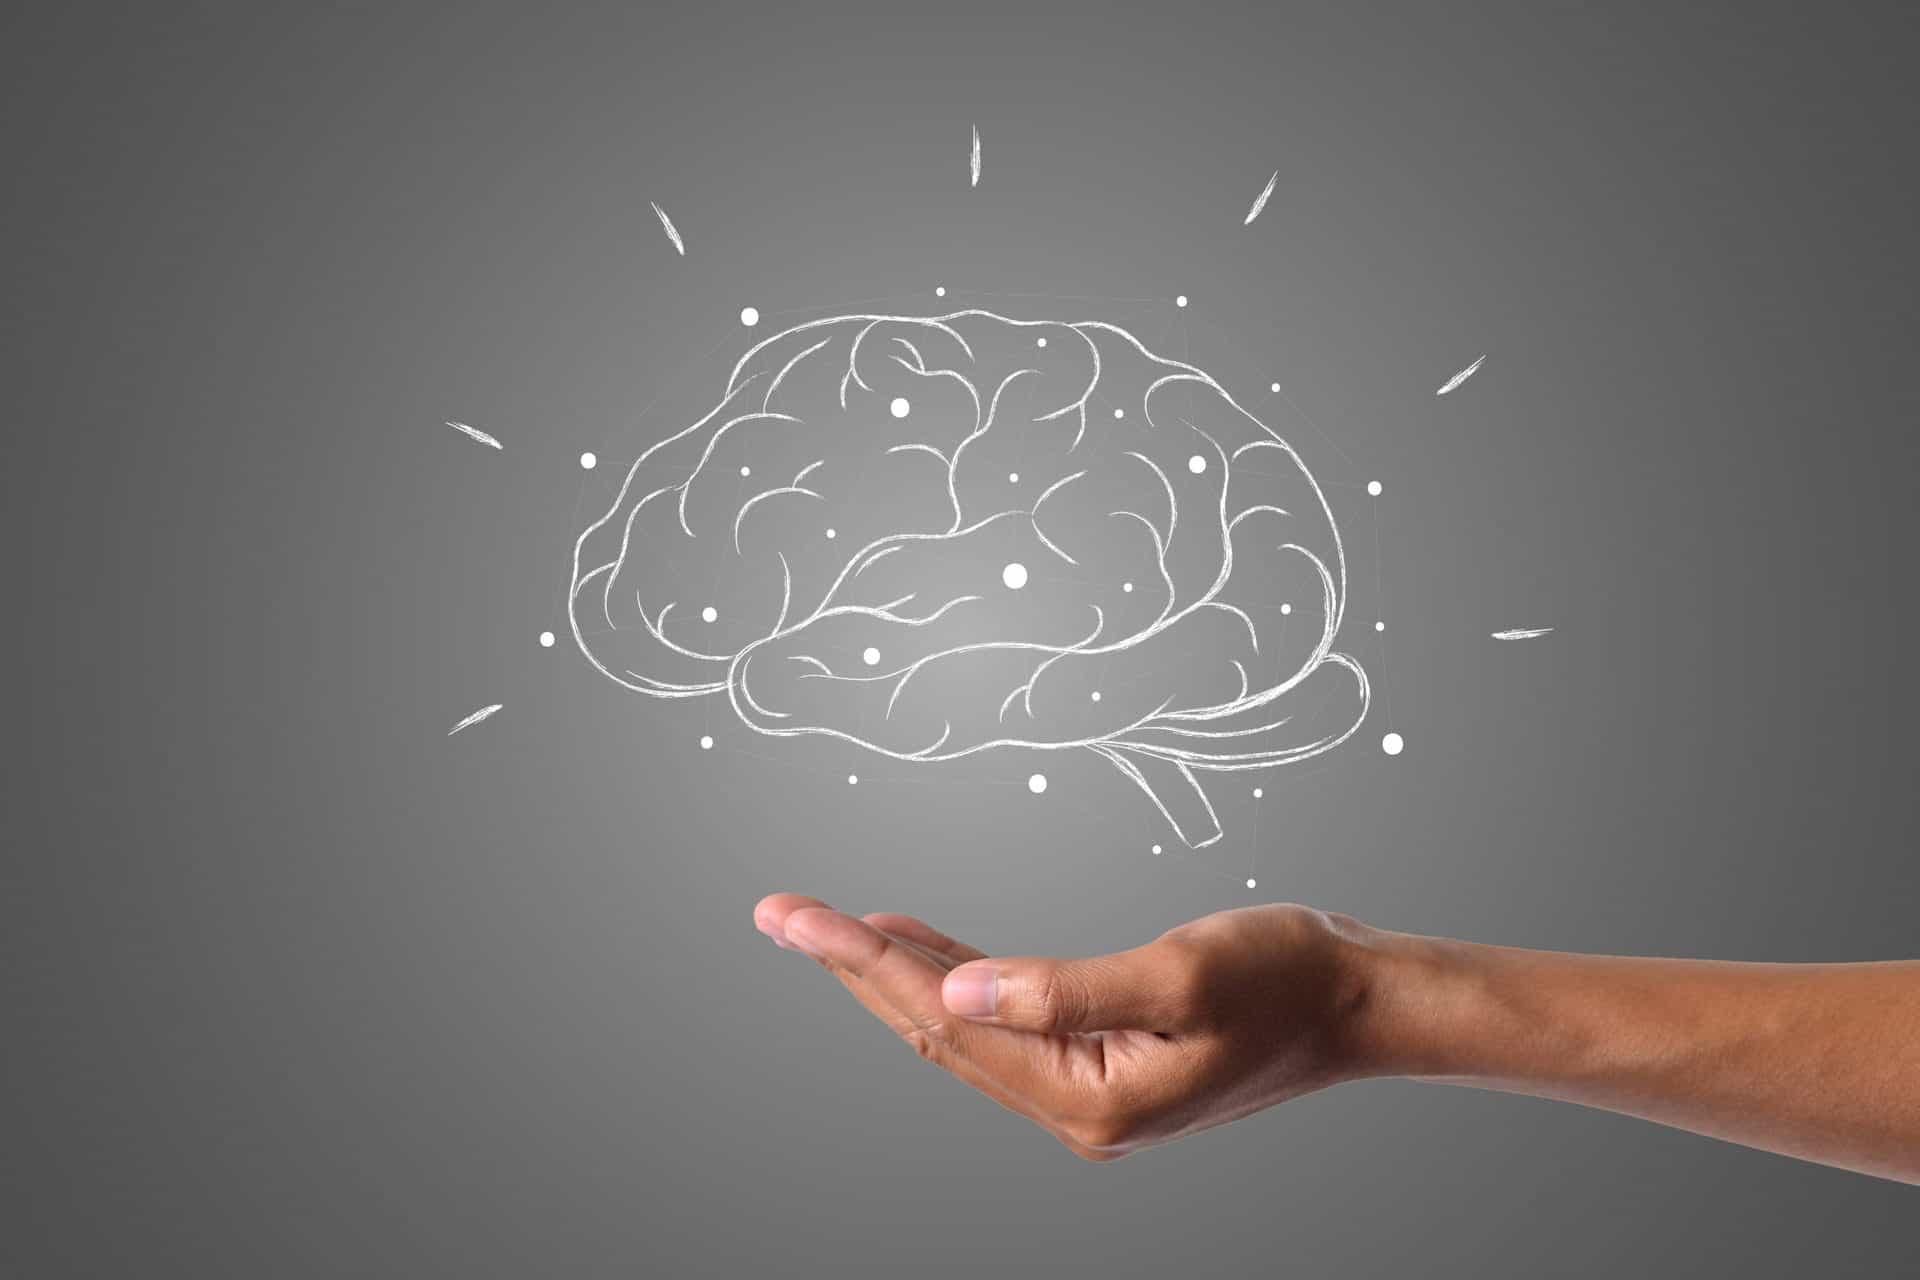 man-holding-brain-illustration